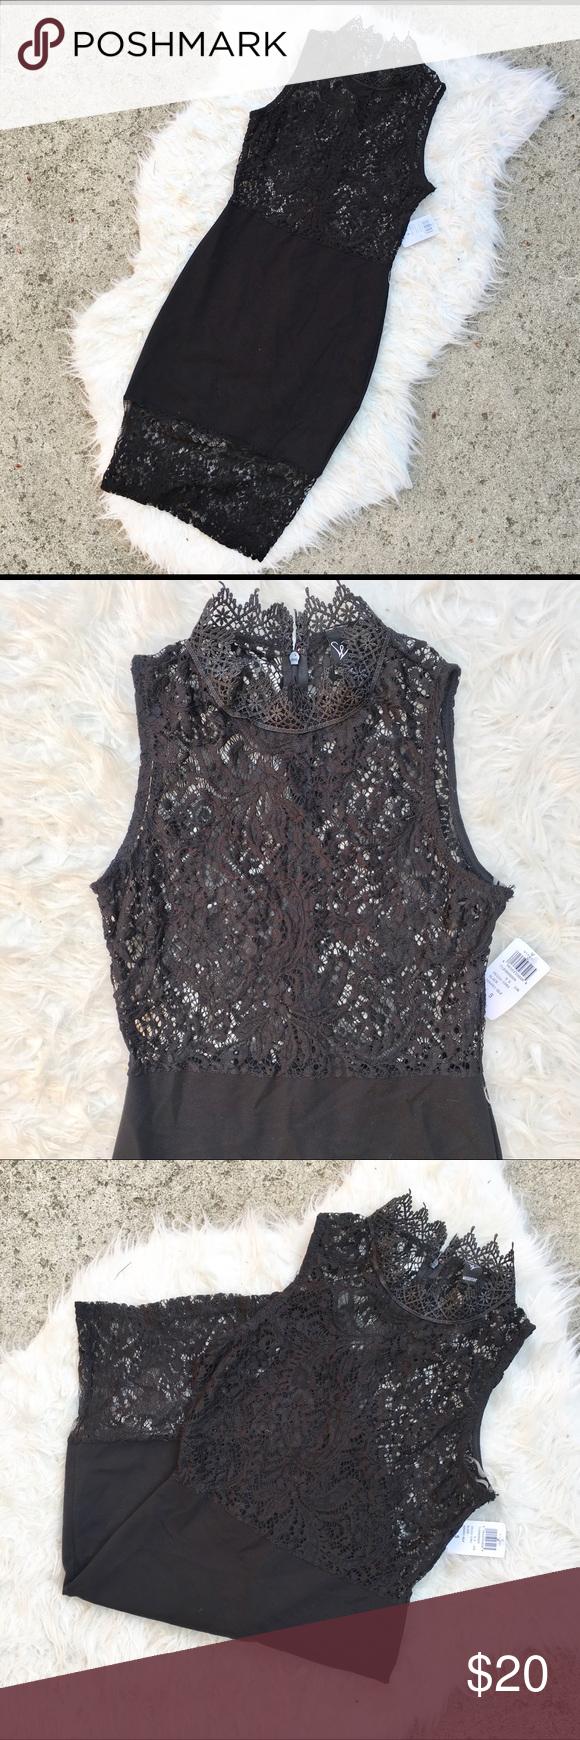 Lace dress tight  Black Lace Dress NWT  My Posh Closet  Pinterest  Lace dress black